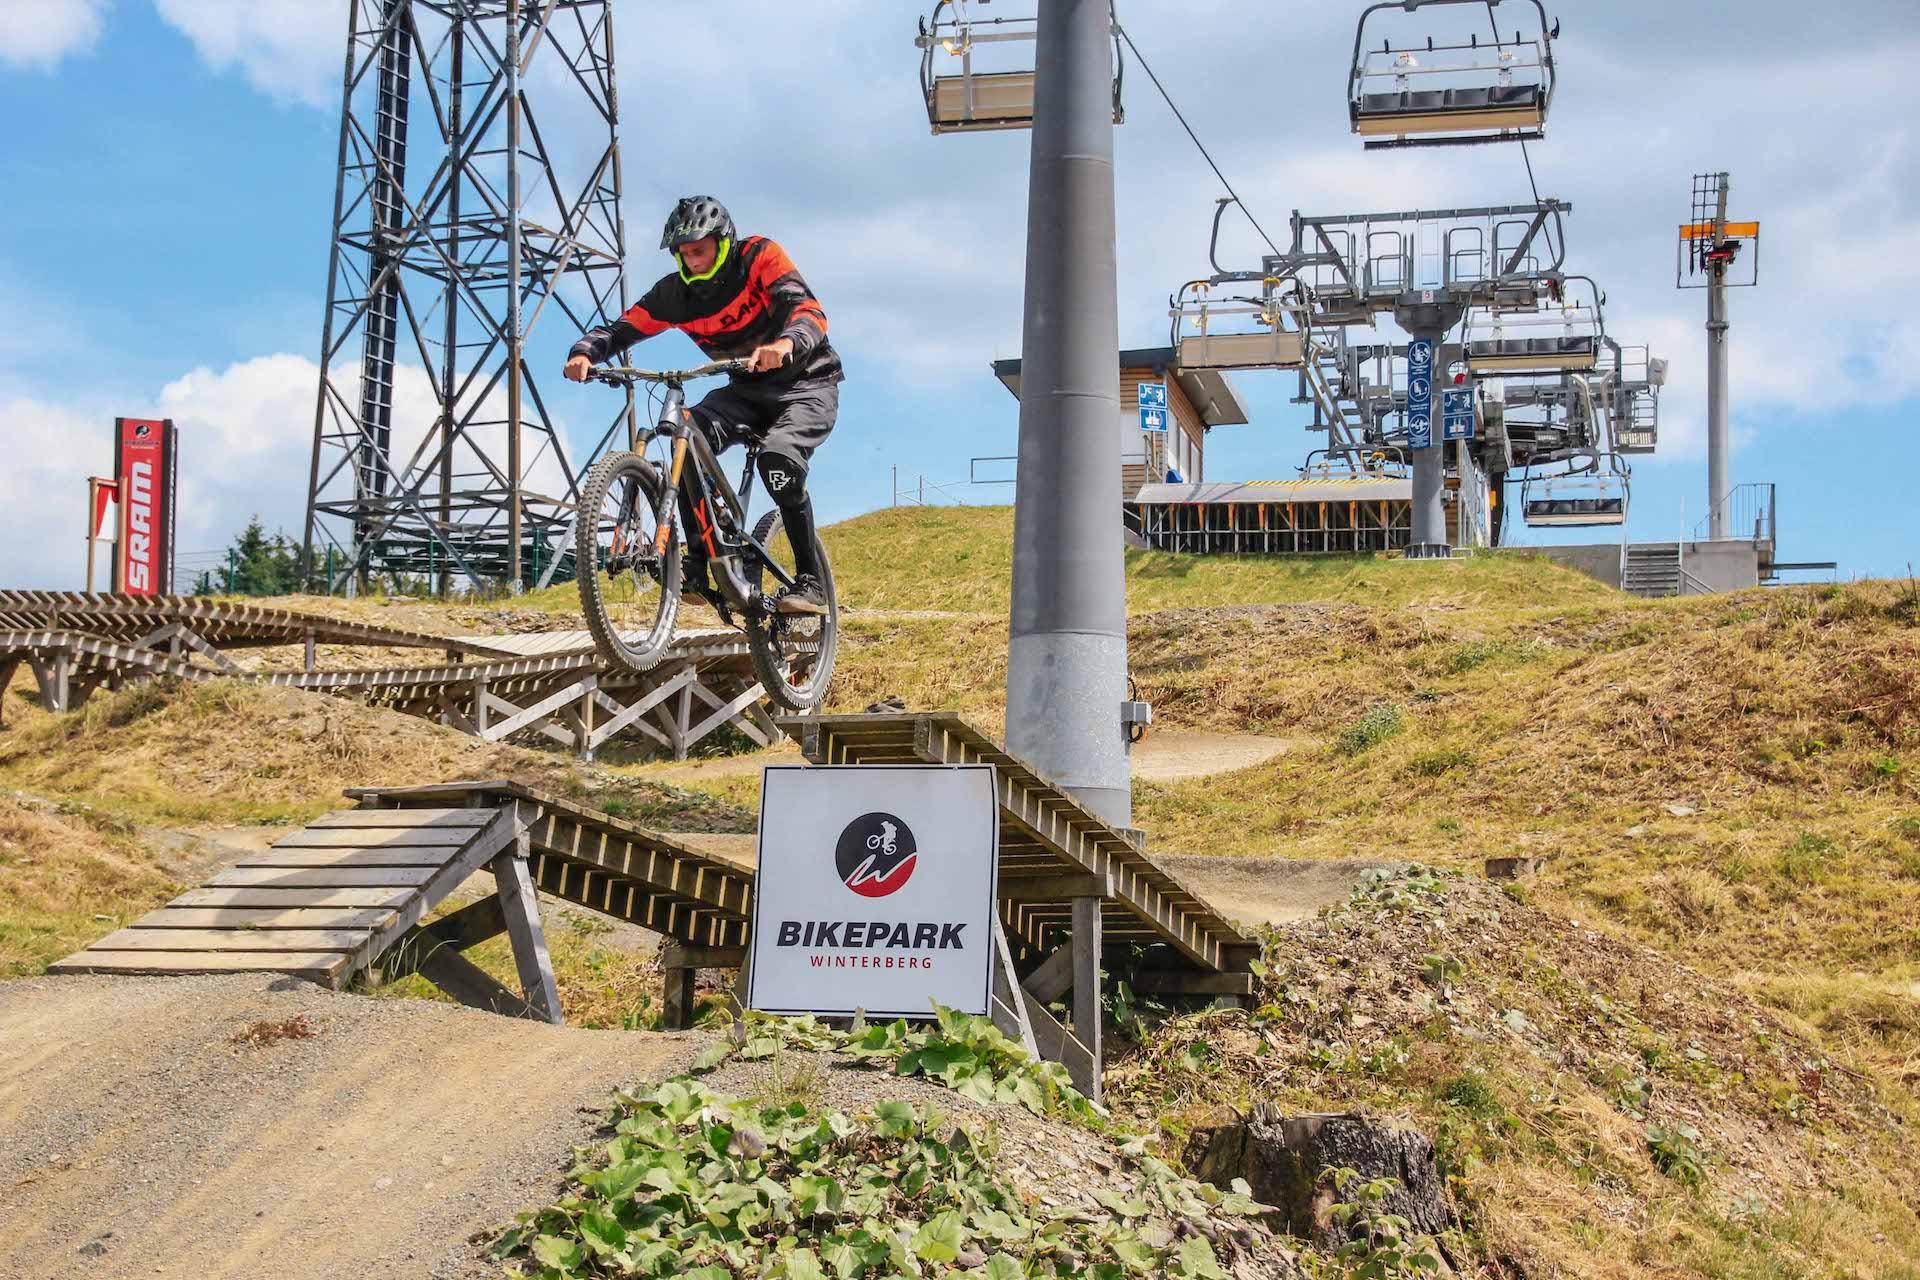 Experten Fahrtechnik Kurs in Frankfurt   Taunus - Rock my Trail MTB und eBike Bikeschule